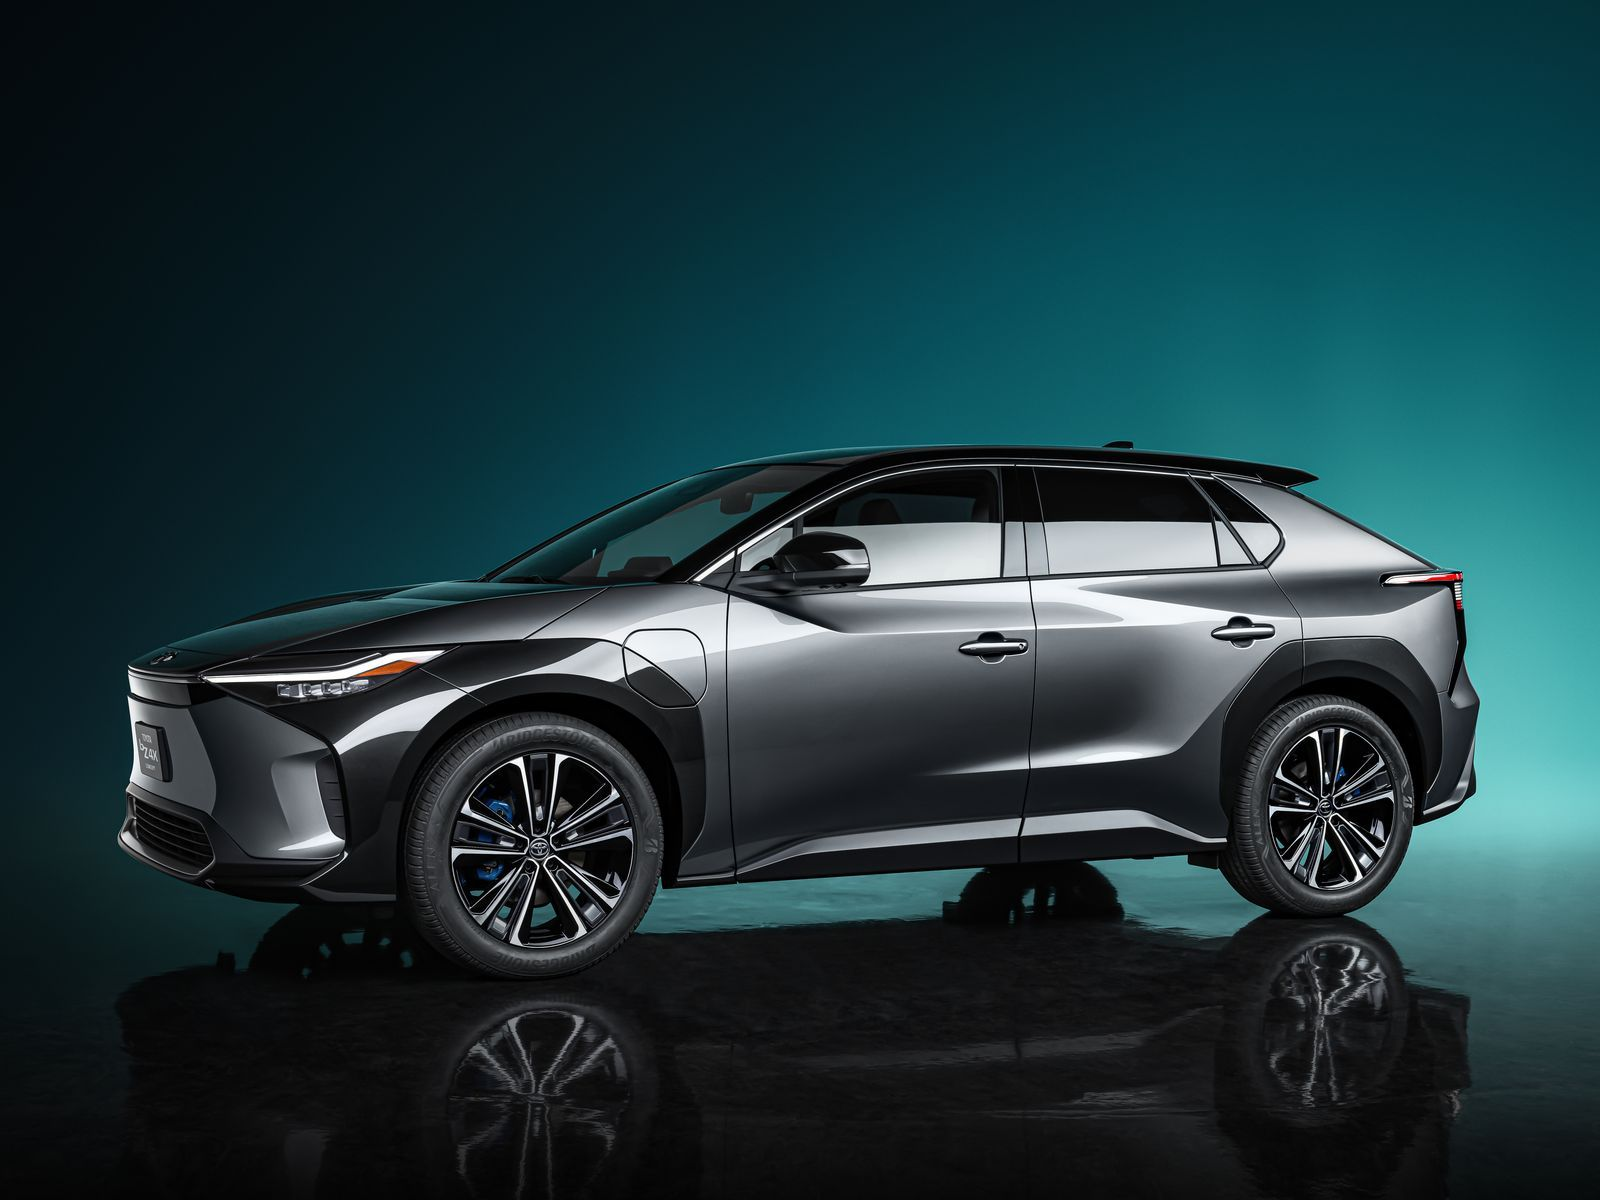 Toyota_bZ4X_Concept_001